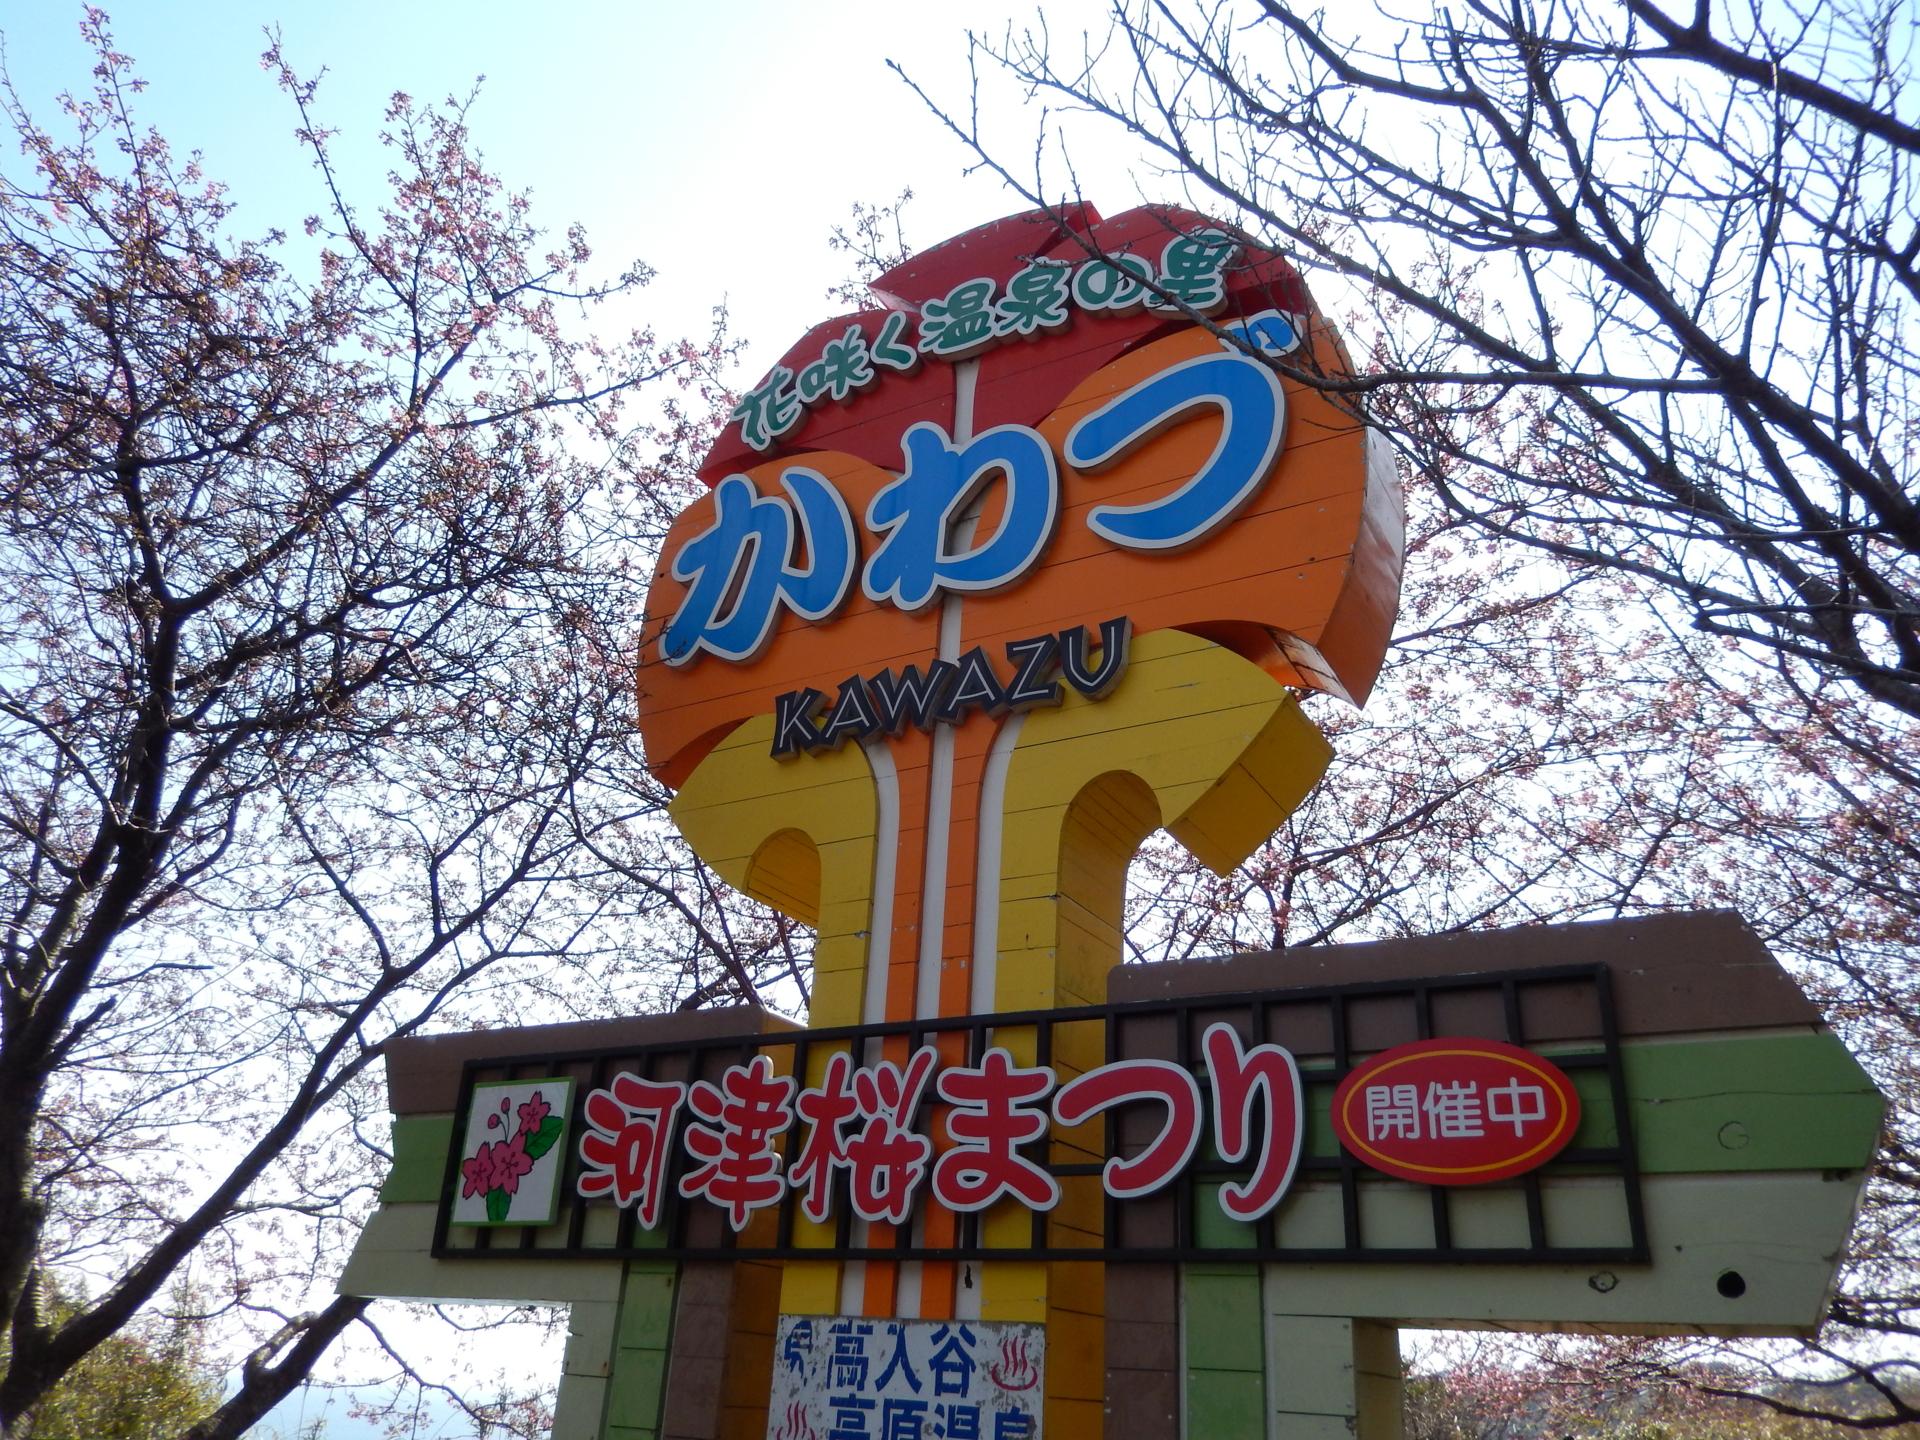 f:id:ToshUeno:20150215125240j:plain